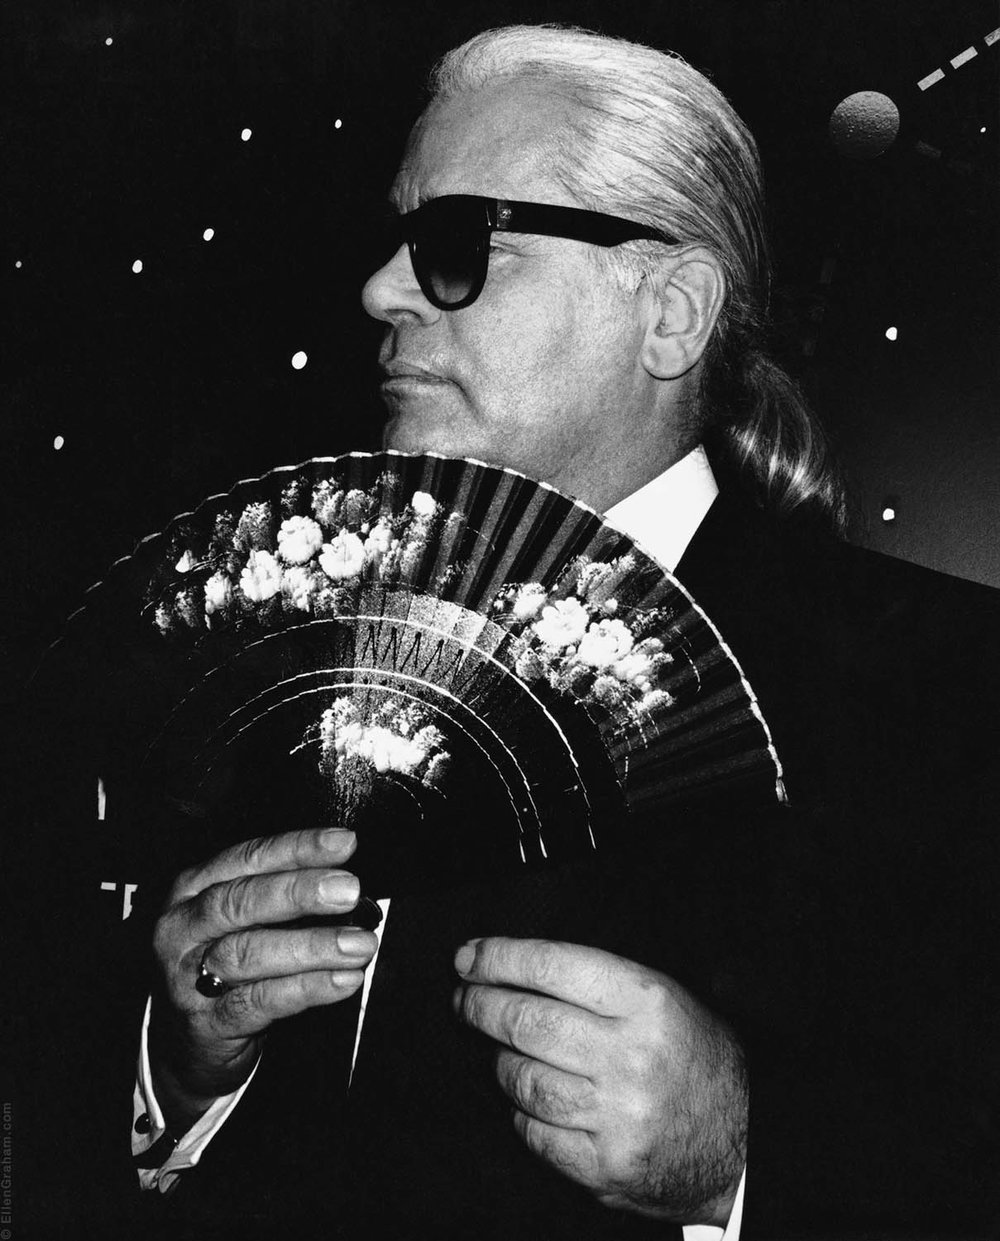 Karl Lagerfeld, Paris, France, 1995